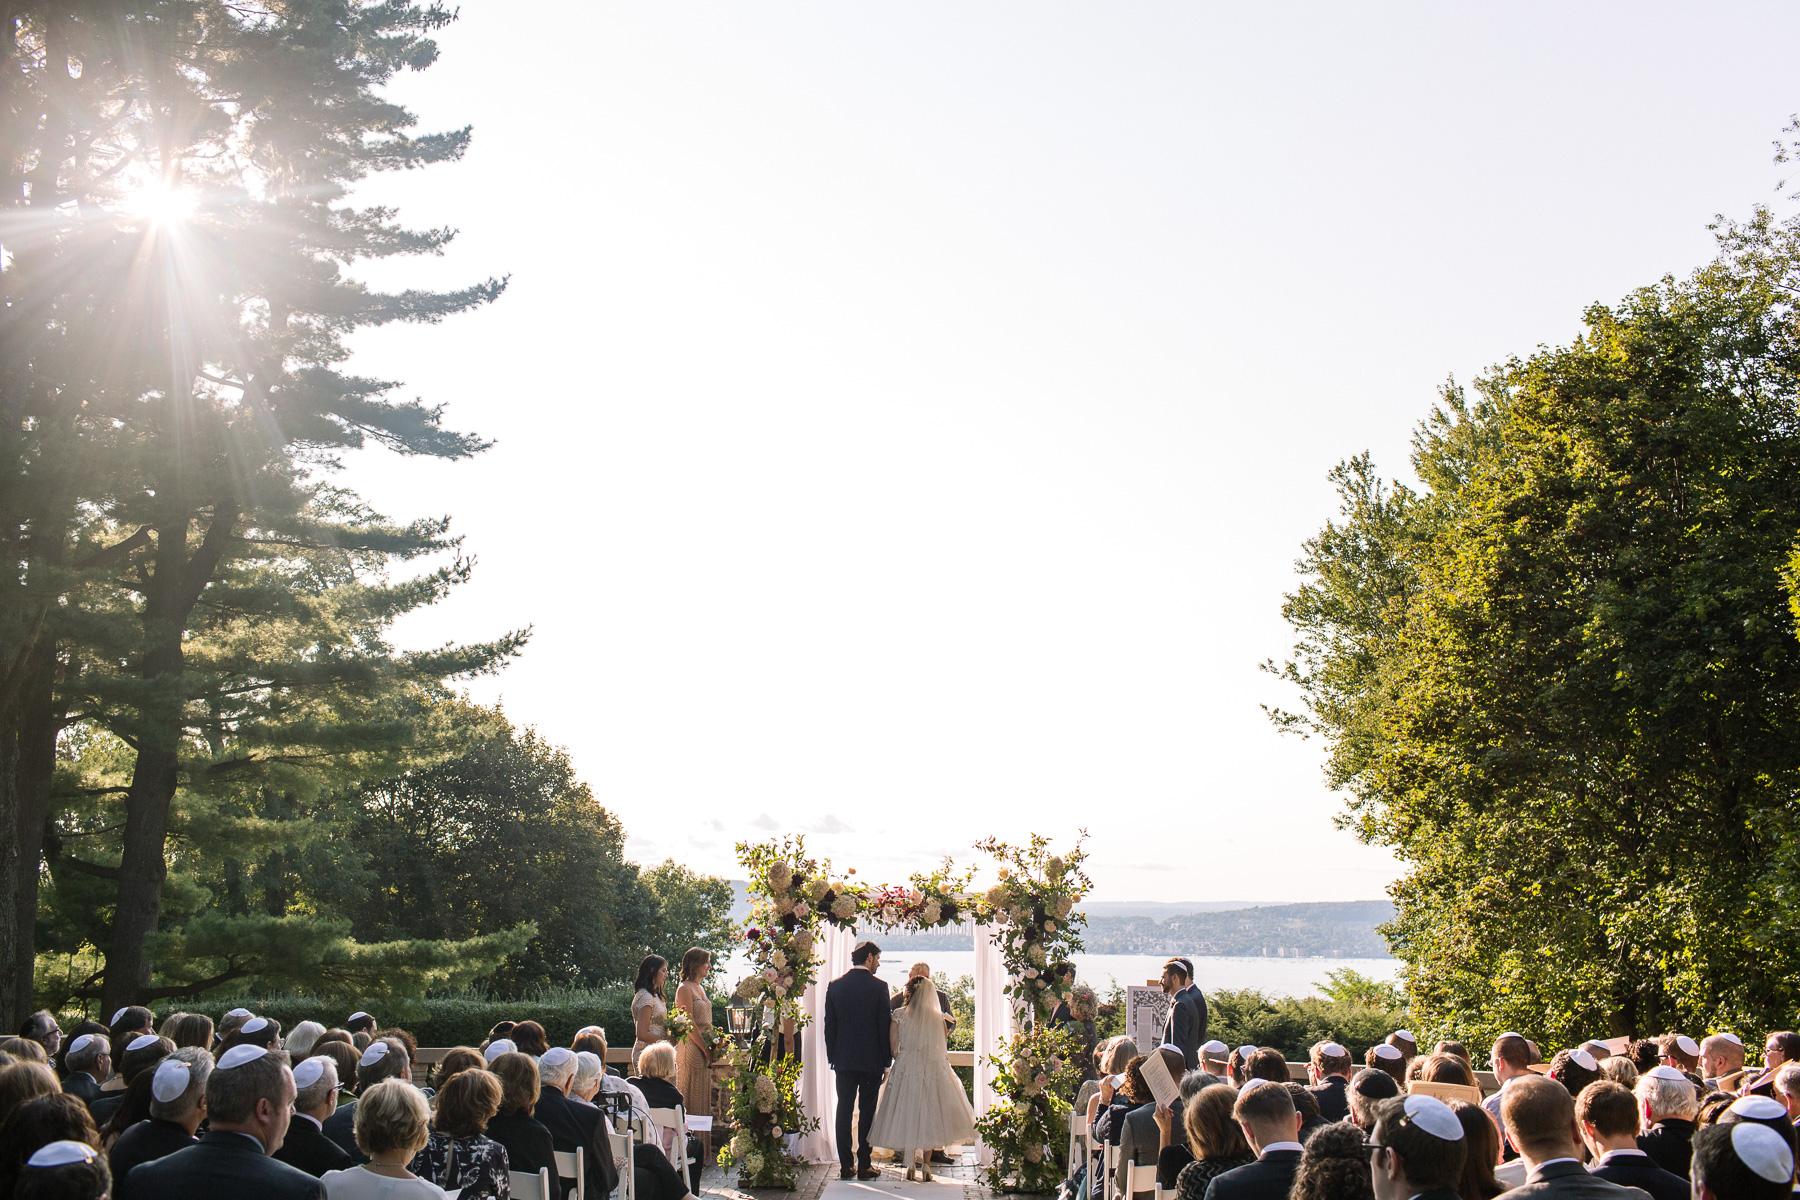 2017_NYC_Wedding_Photographer_Nontraditional_Candid-77.jpg